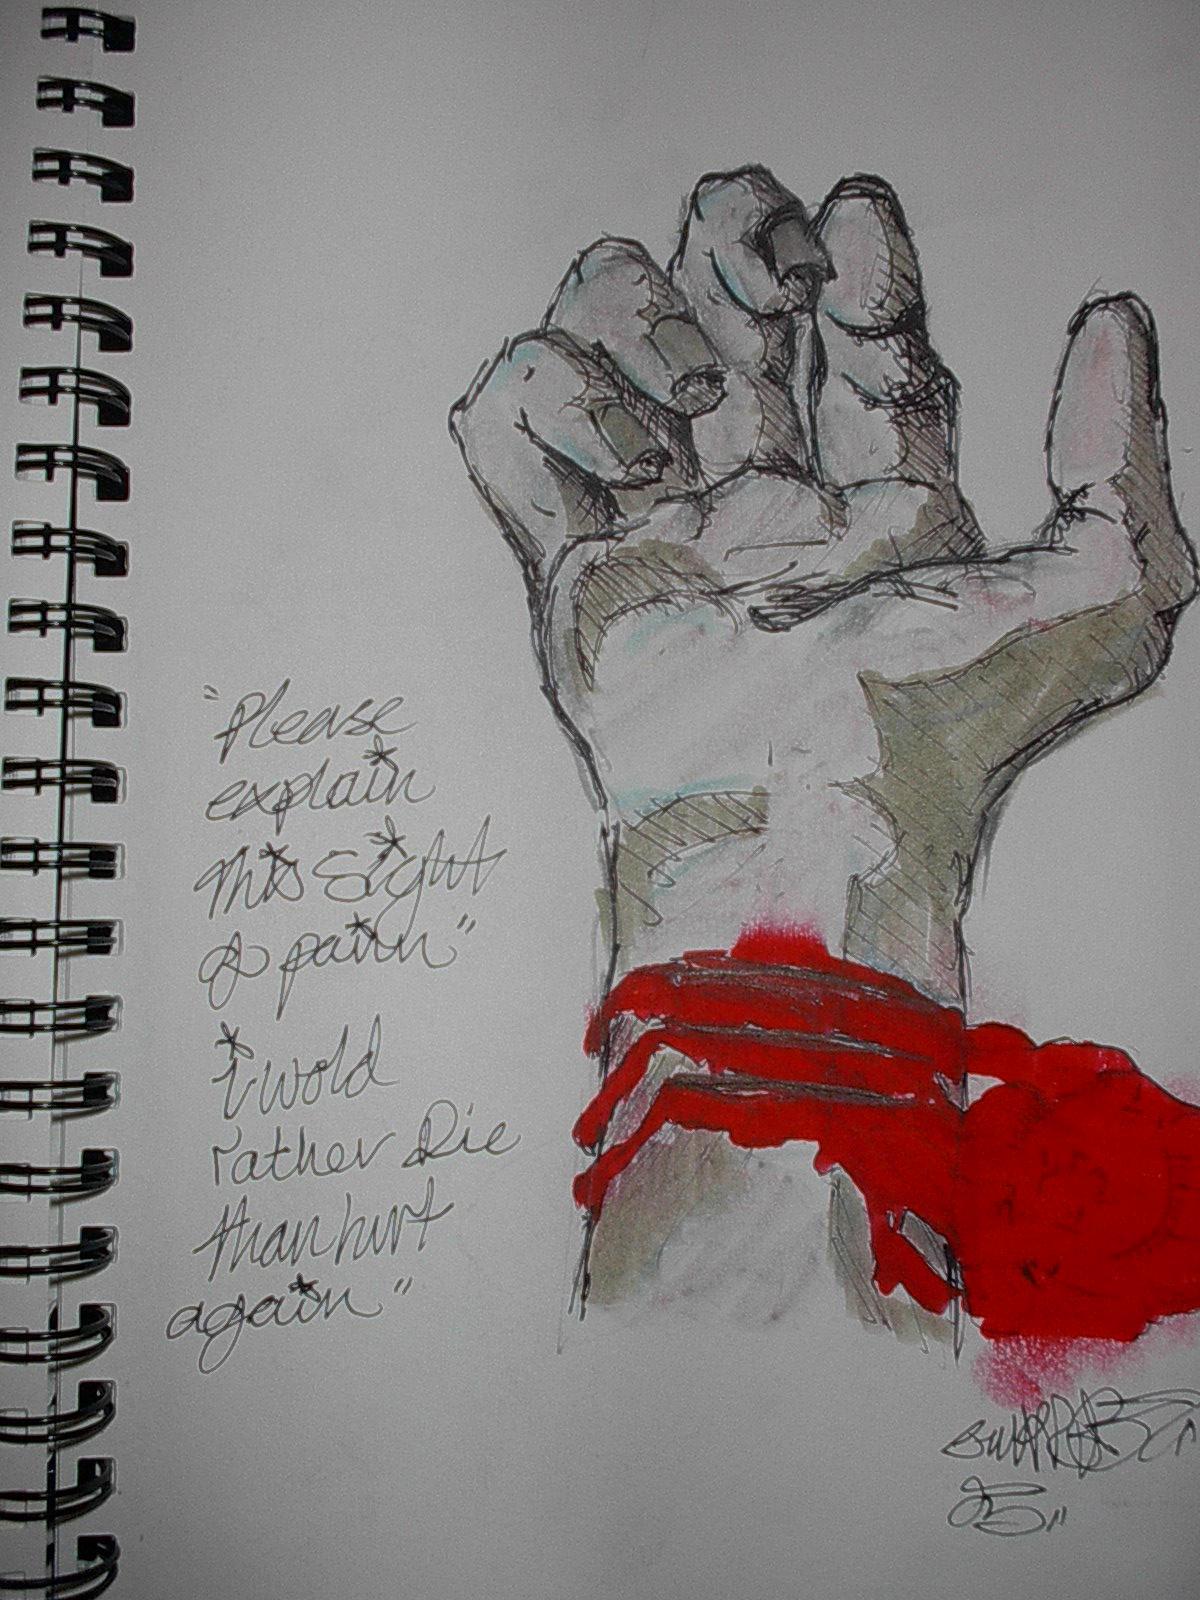 bleeding wrist drawing - HD1200×1600